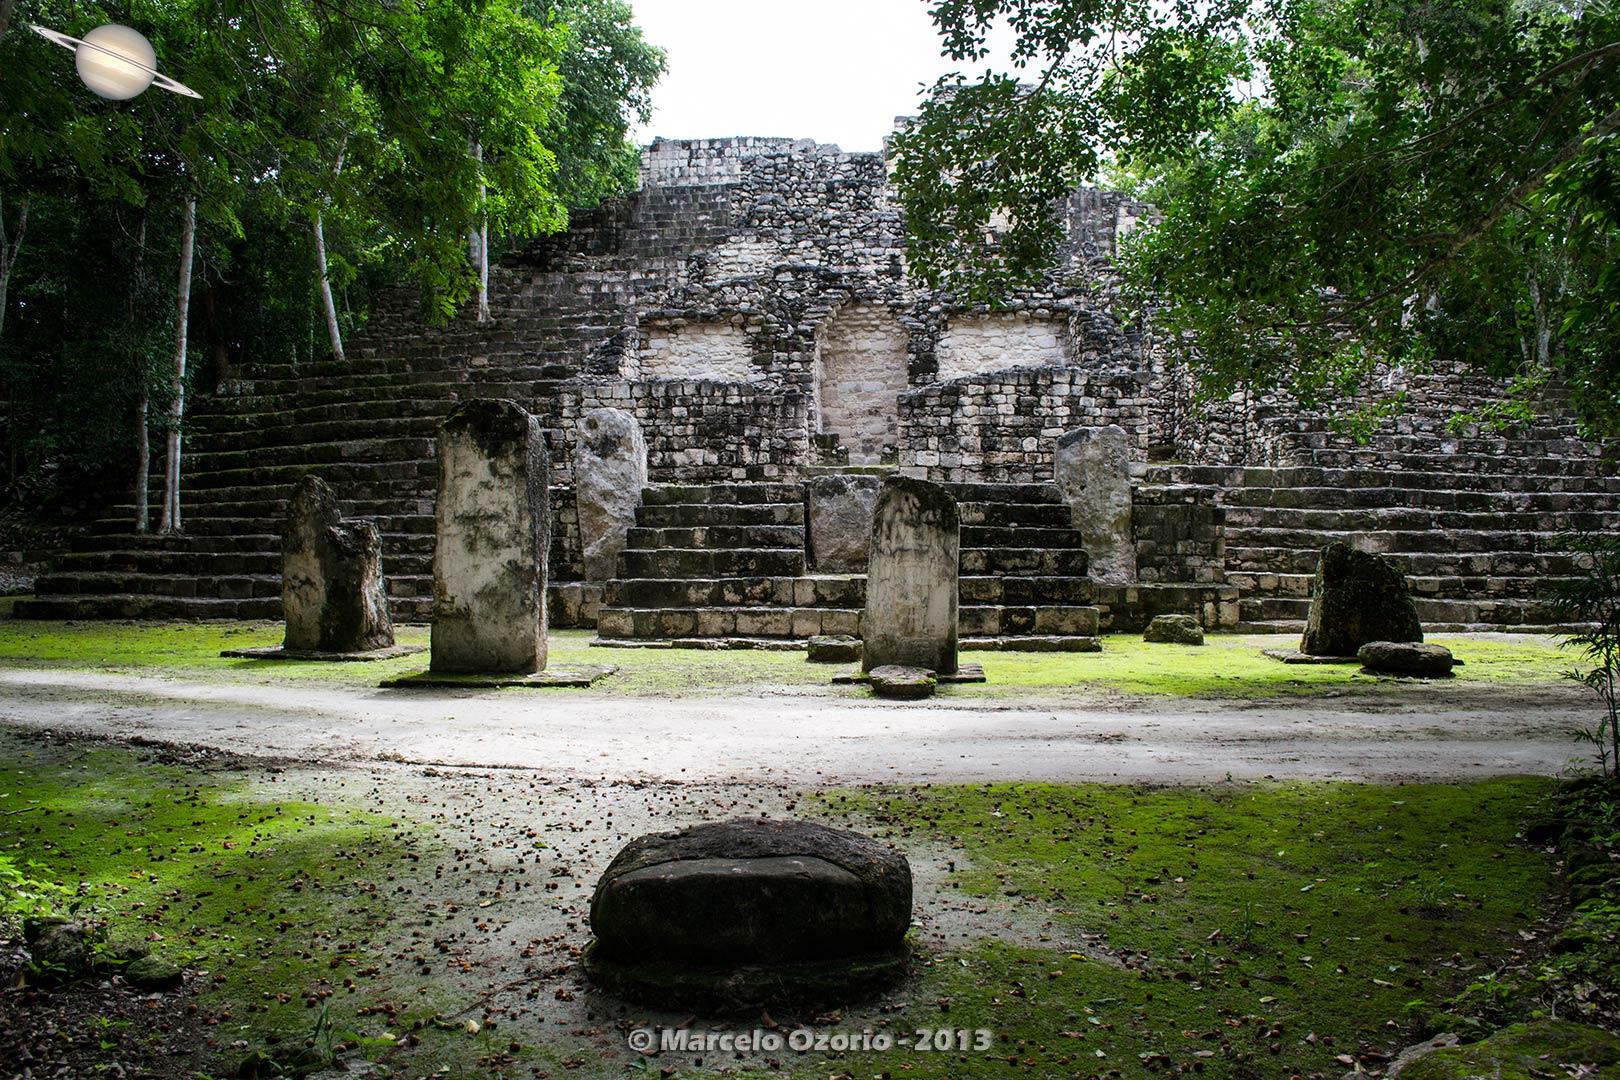 calakmul mayan civilization mexico 20 - Calakmul, City of the Two Adjacent Pyramids - Mexico